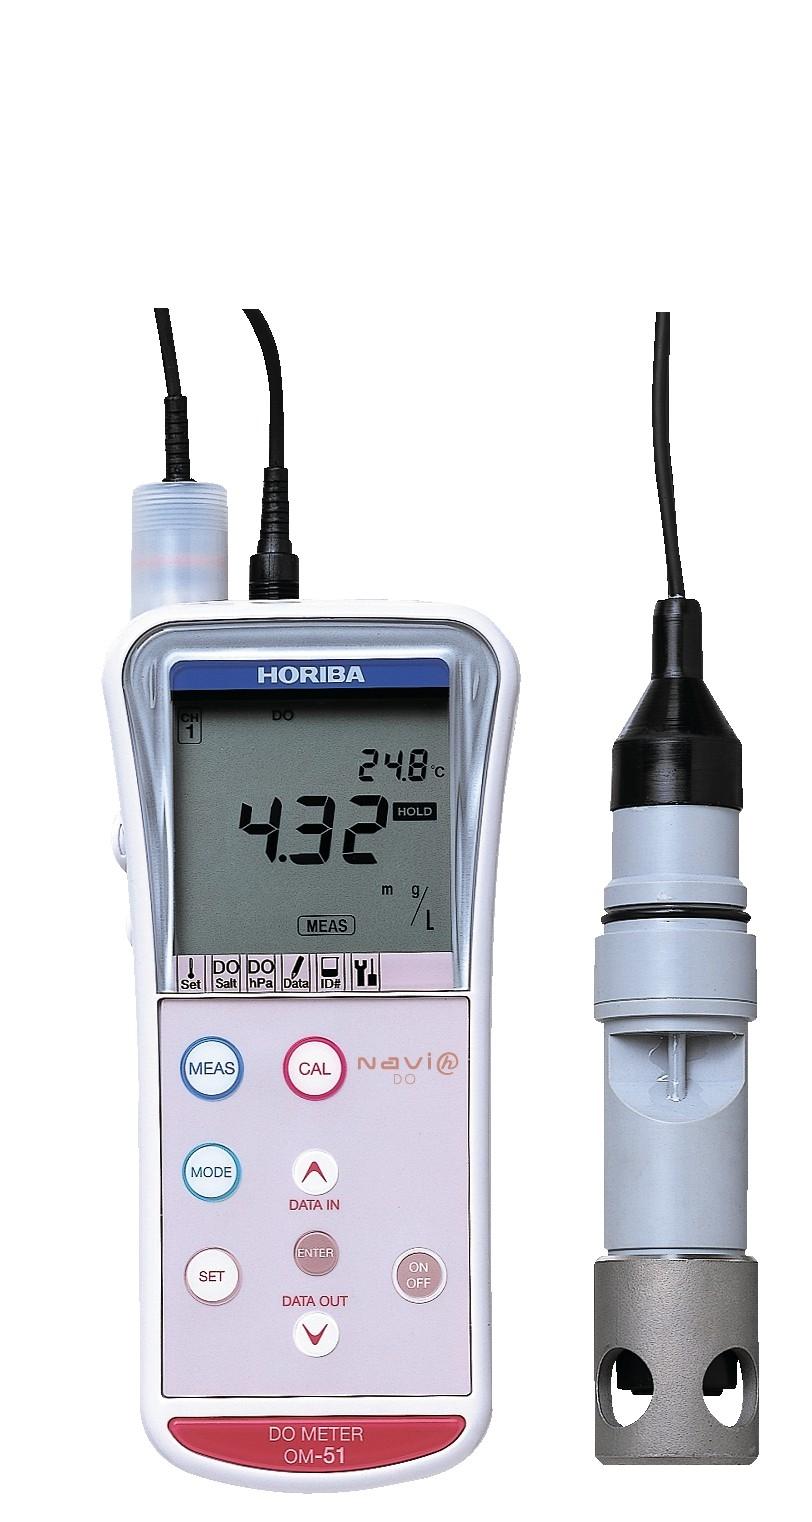 Horiba B 173 Conductivity Meter : Horiba om portable dissolved oxygen meter